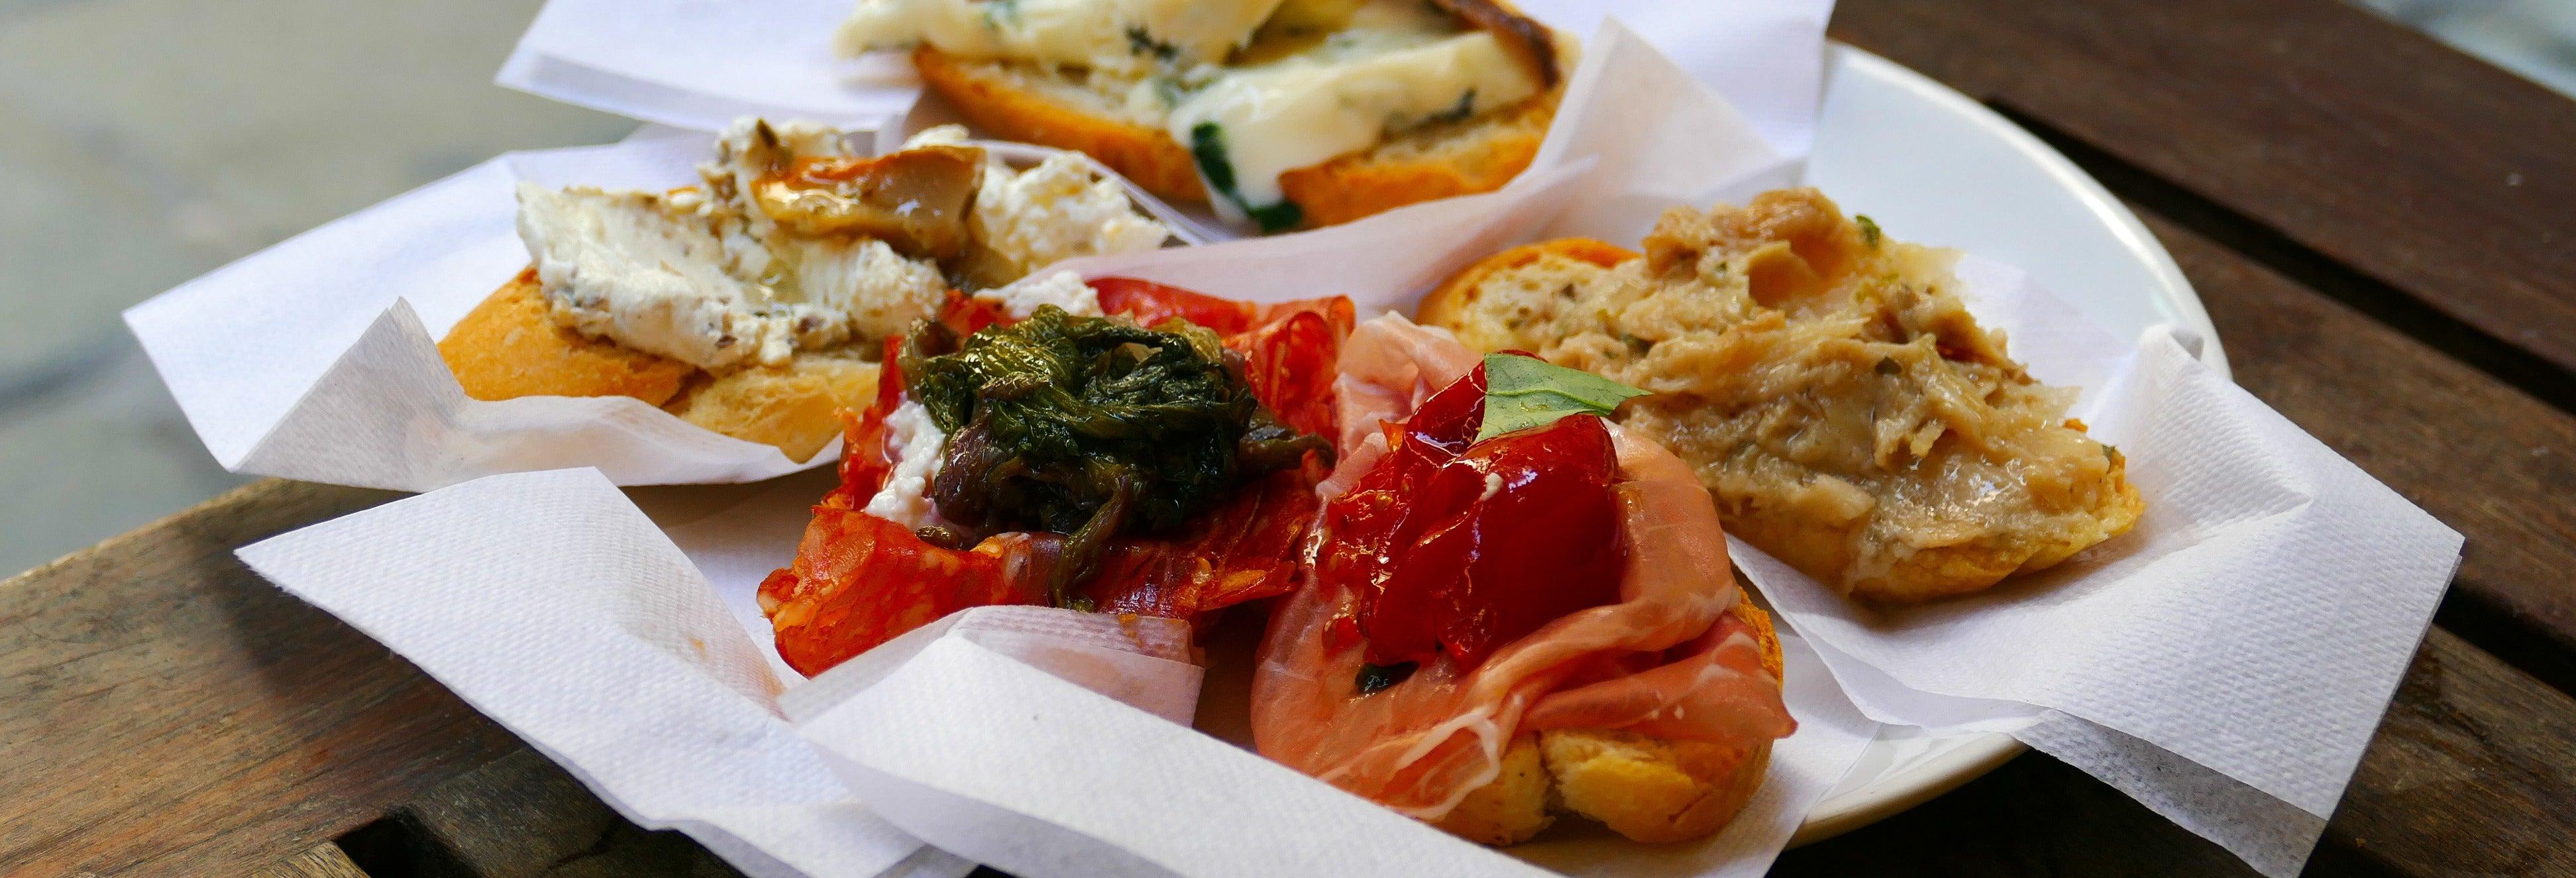 Tour gastronómico por Venecia